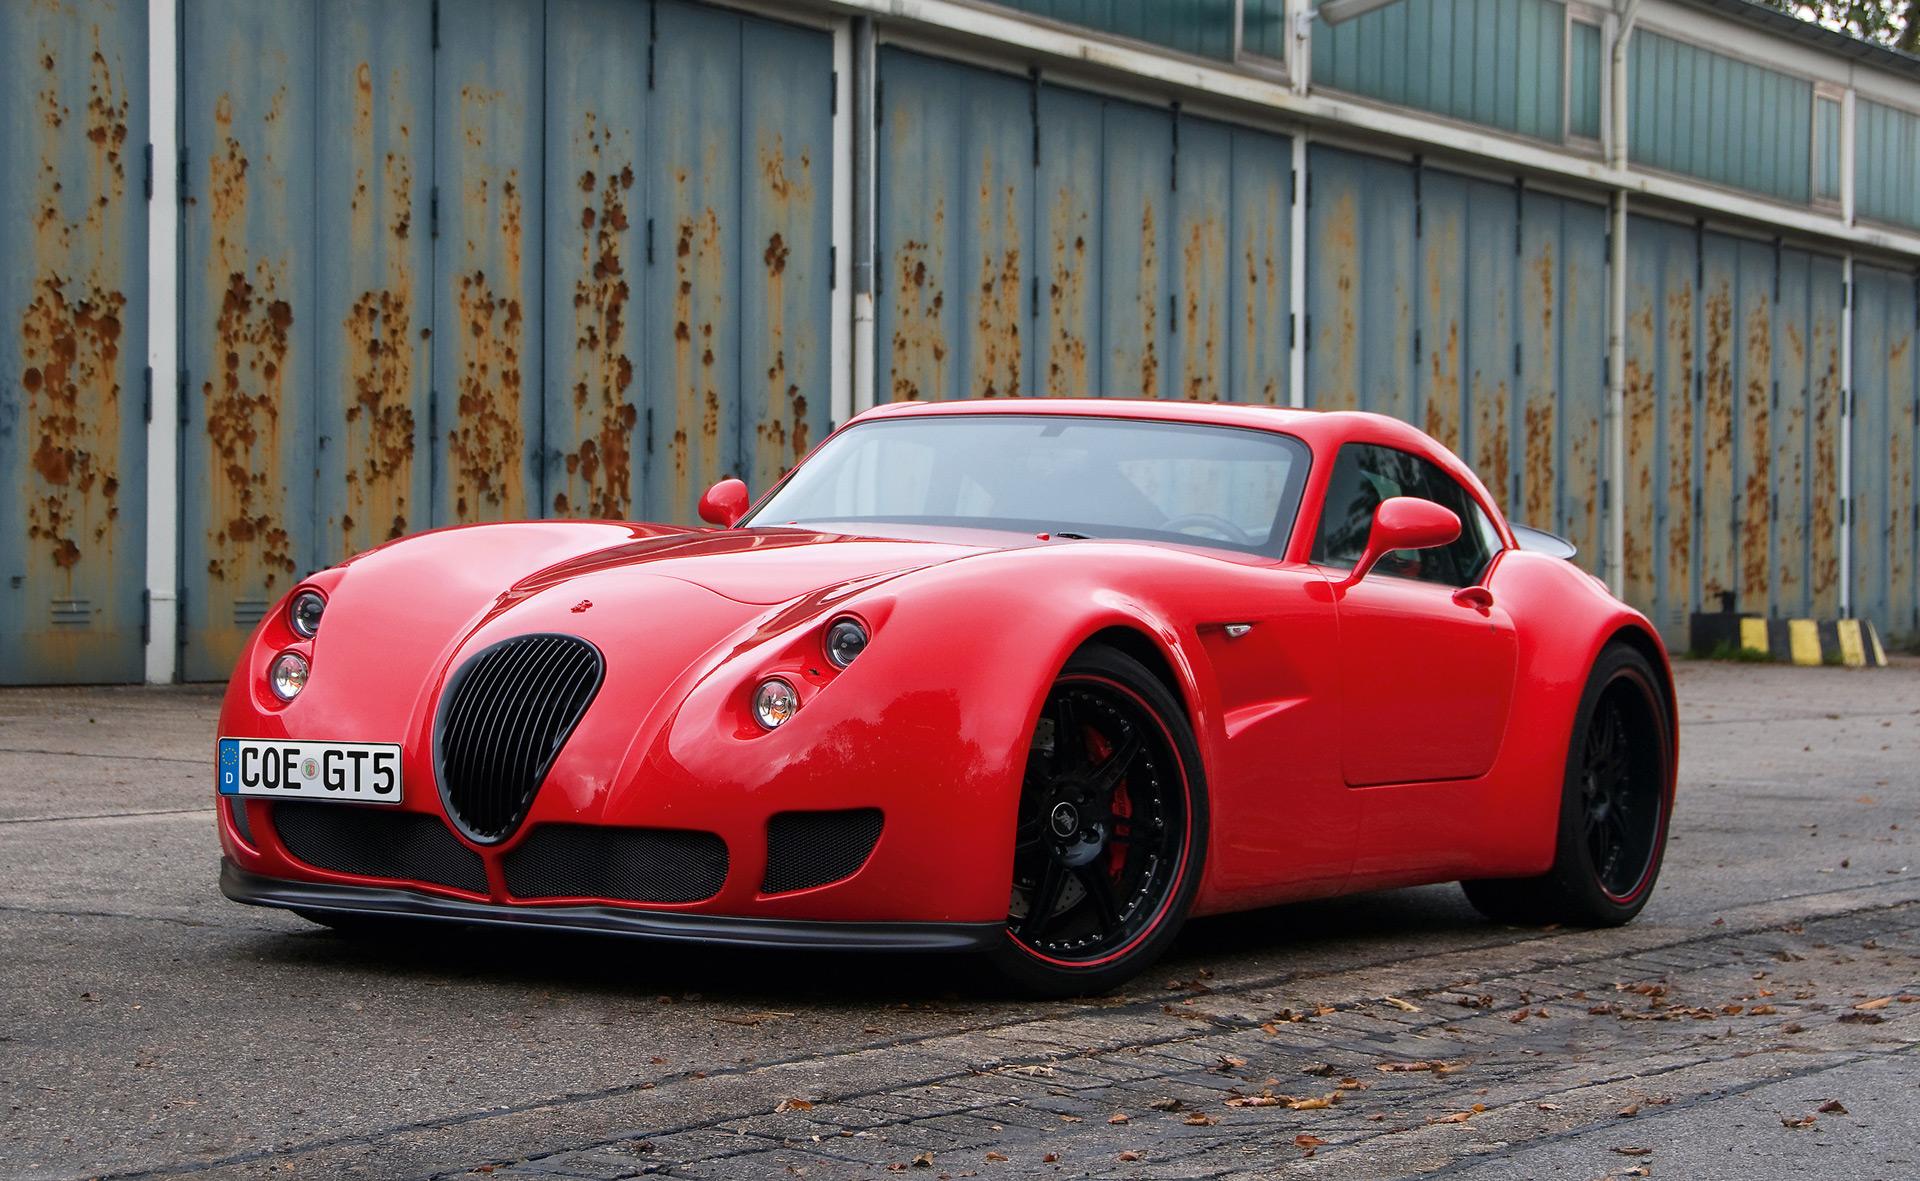 New Car 2019: New Wiesmann Sports Car Coming In 2019